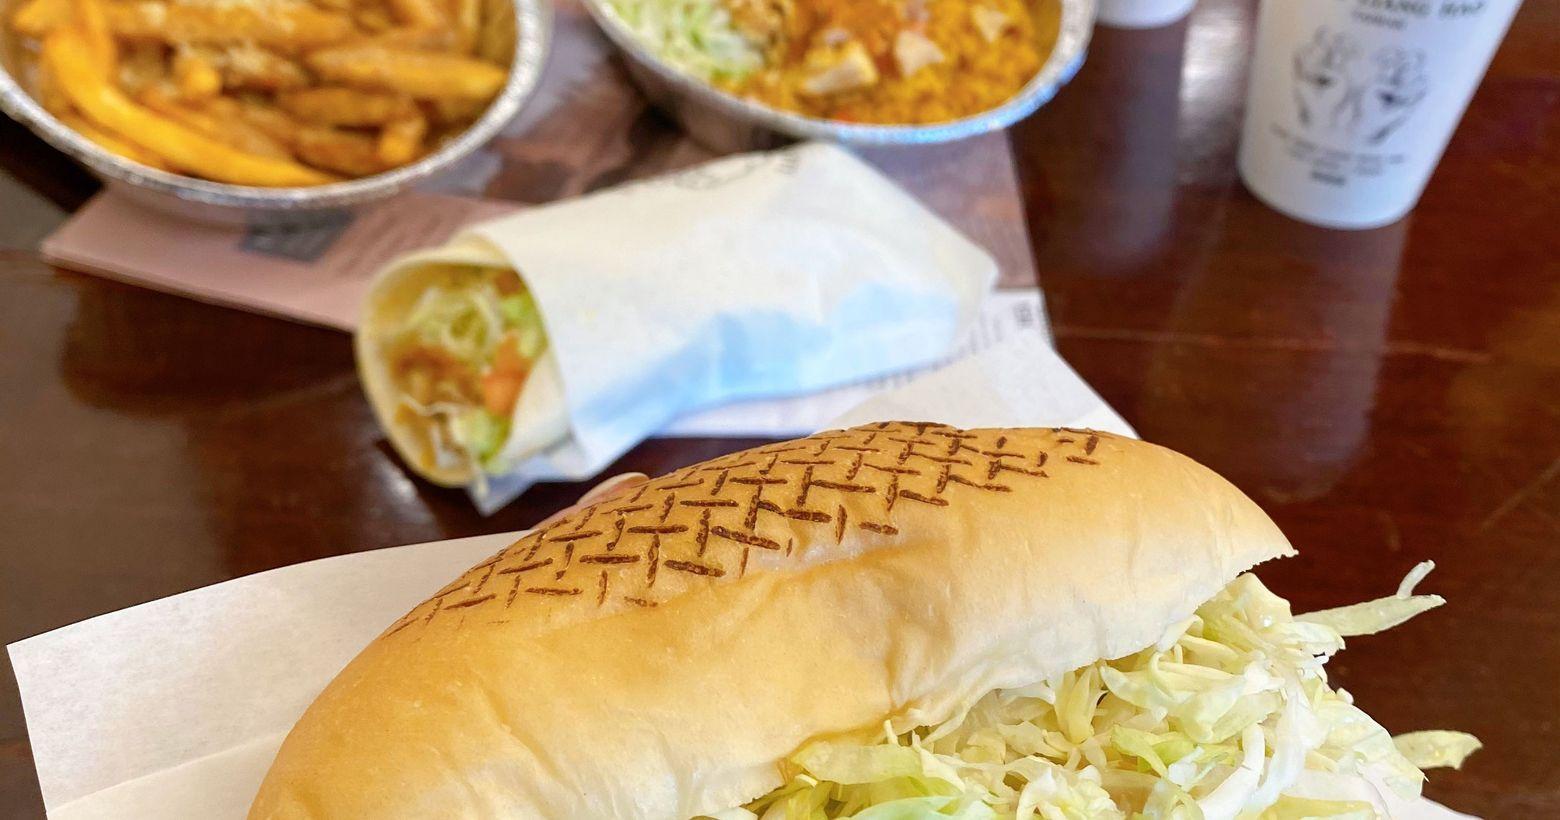 22 KEBAB#君君歐北呷🔍22KEBAB🔺經典烤雞肉飯+可樂$150🔺經典烤雞奶油肉汁薯條